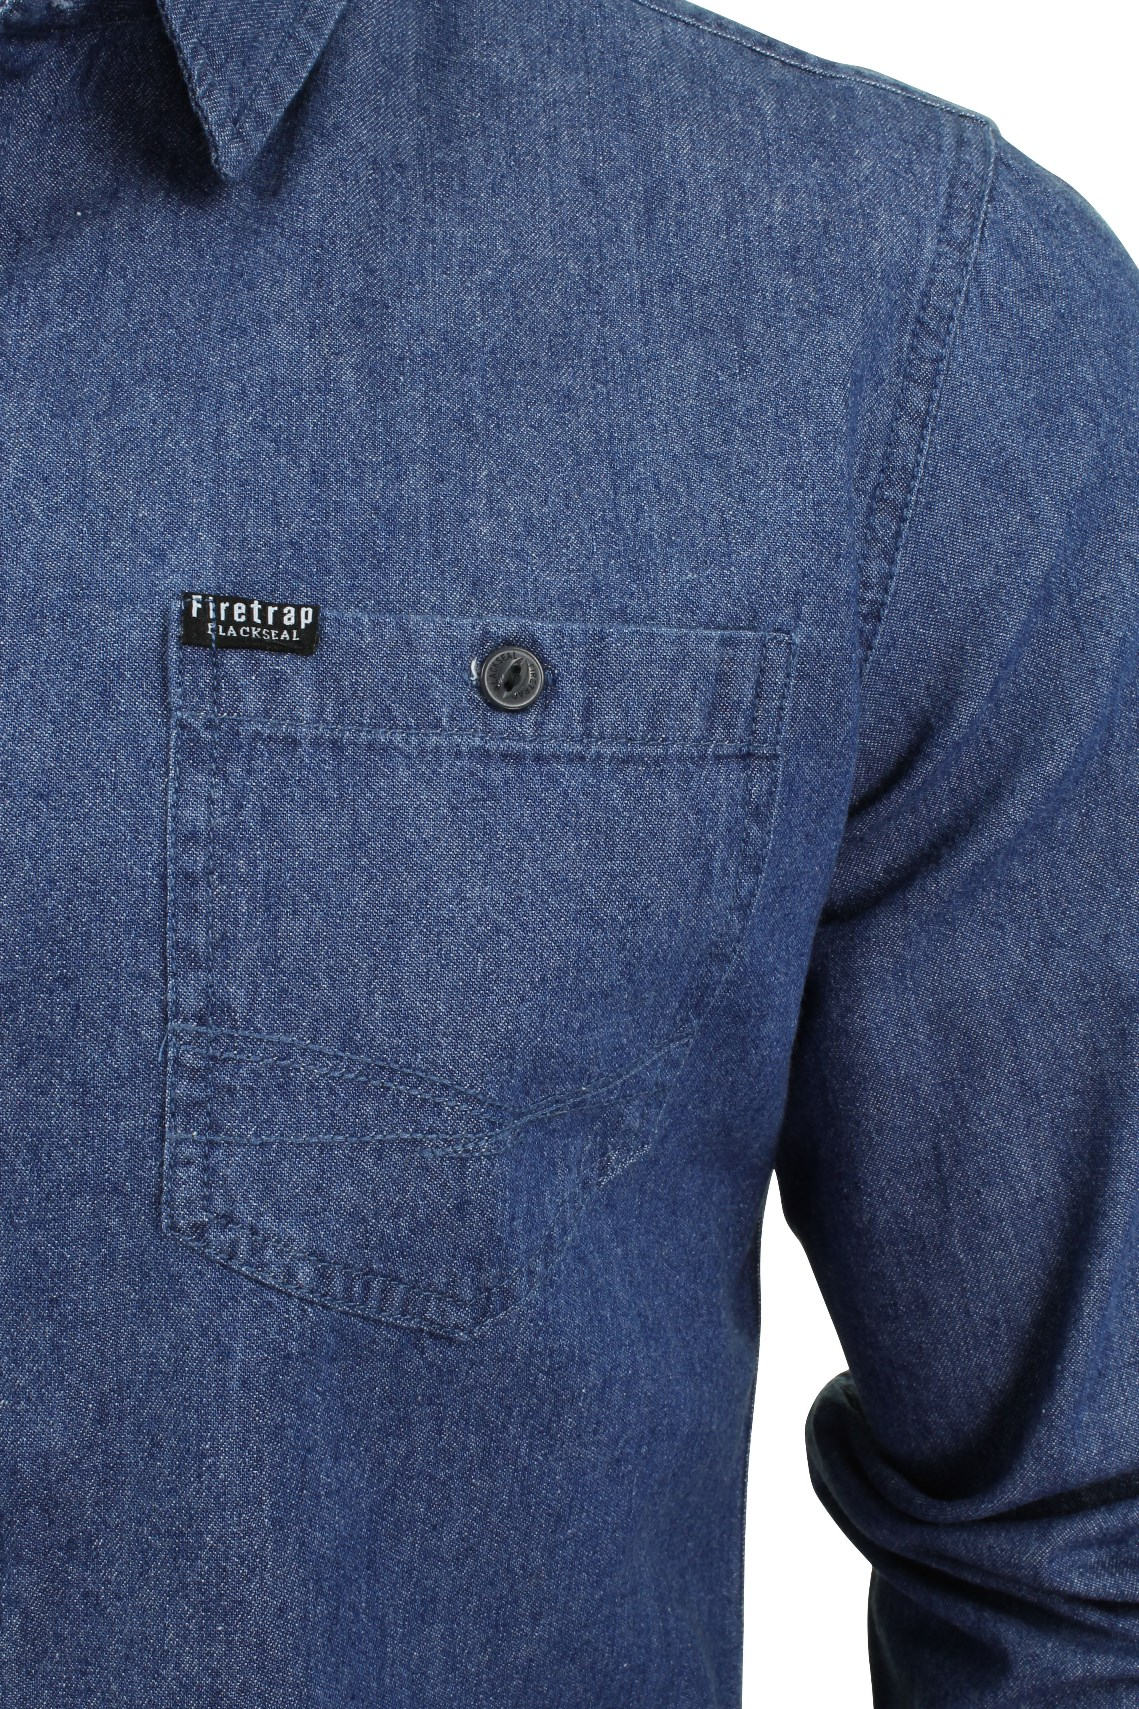 Para-Hombres-Camisa-De-Mezclilla-por-Firetrap-Western-Lavado-Vintage-Manga-Larga miniatura 21